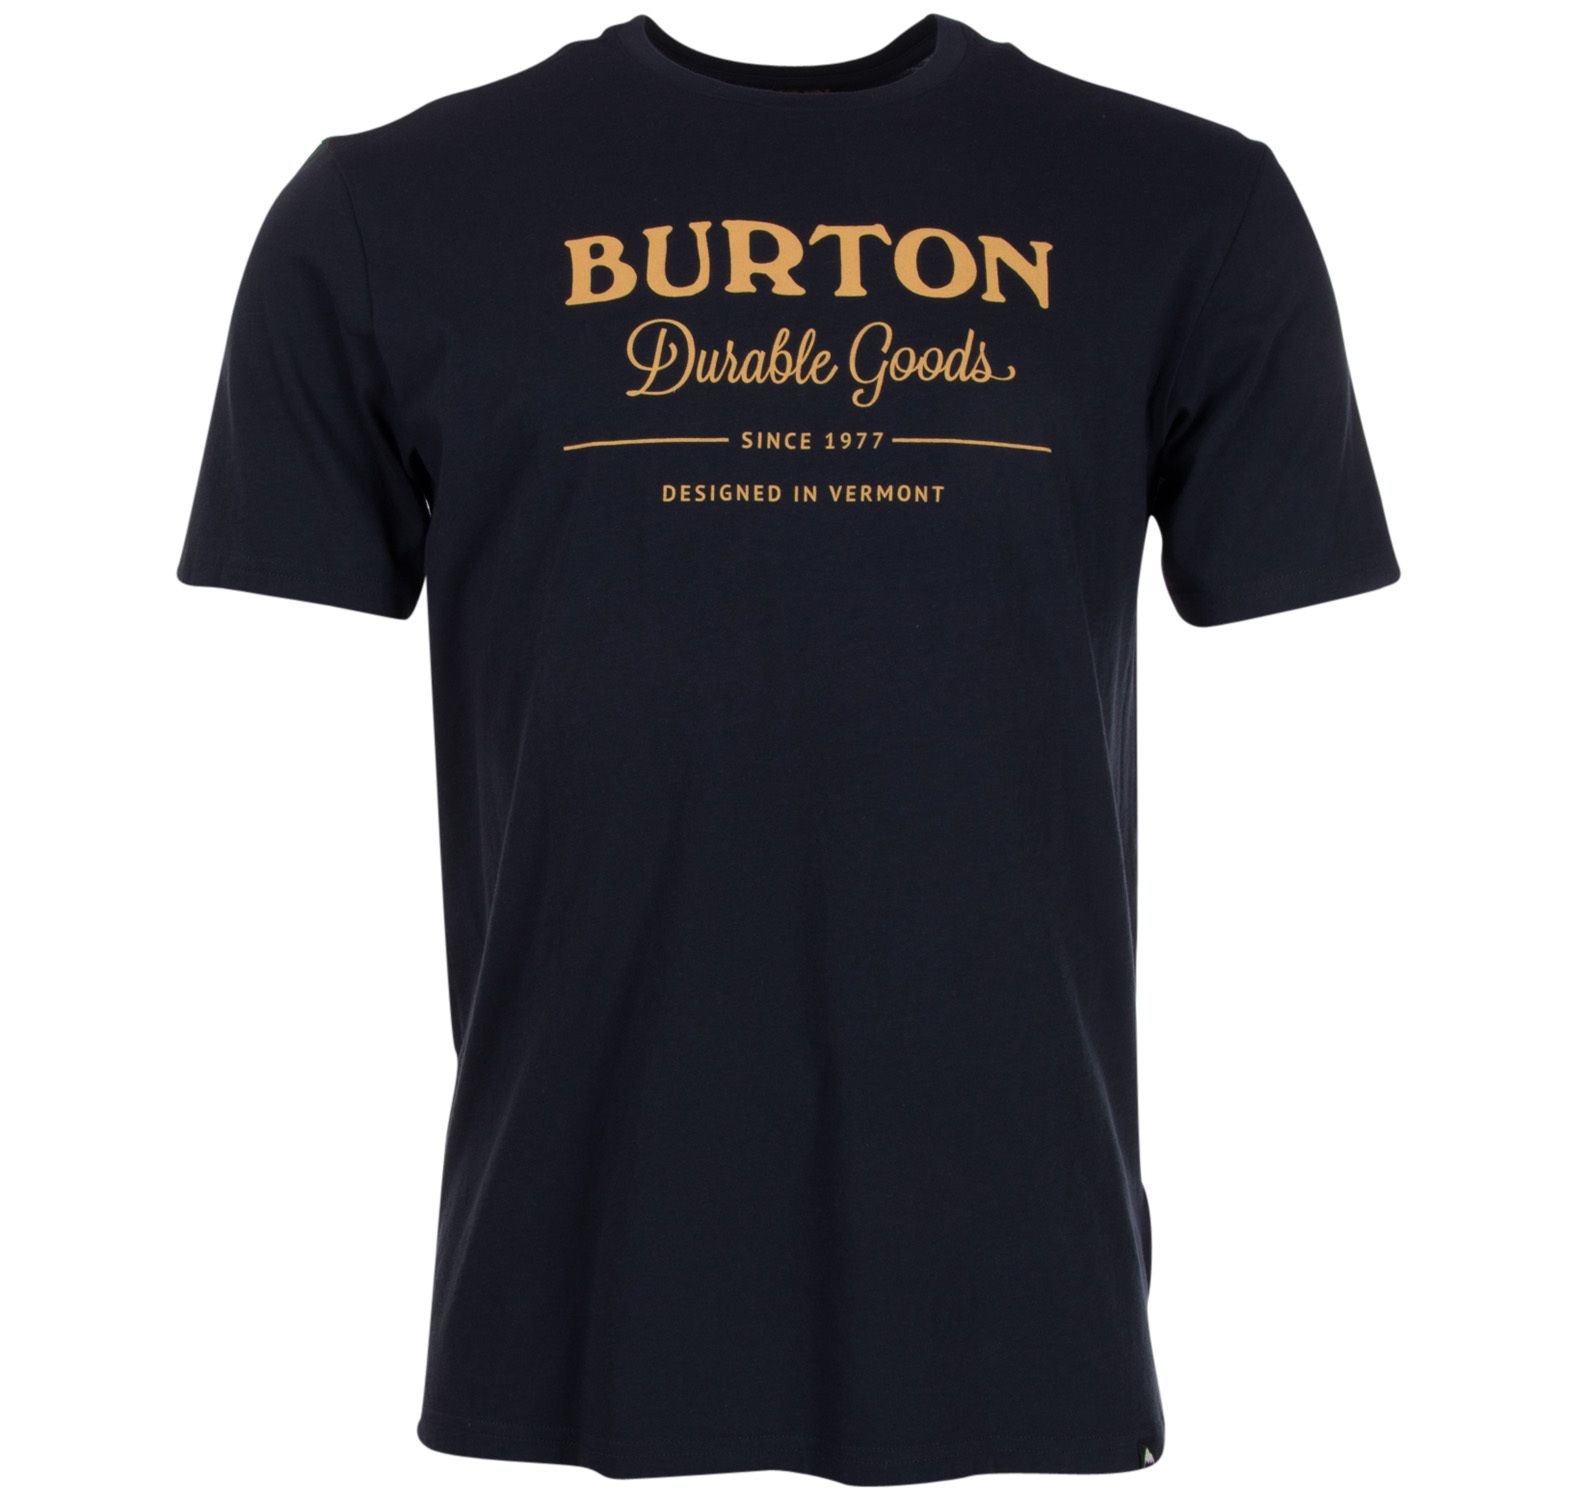 Mb Durable Goods True Black, True Black, Xl,  Burton